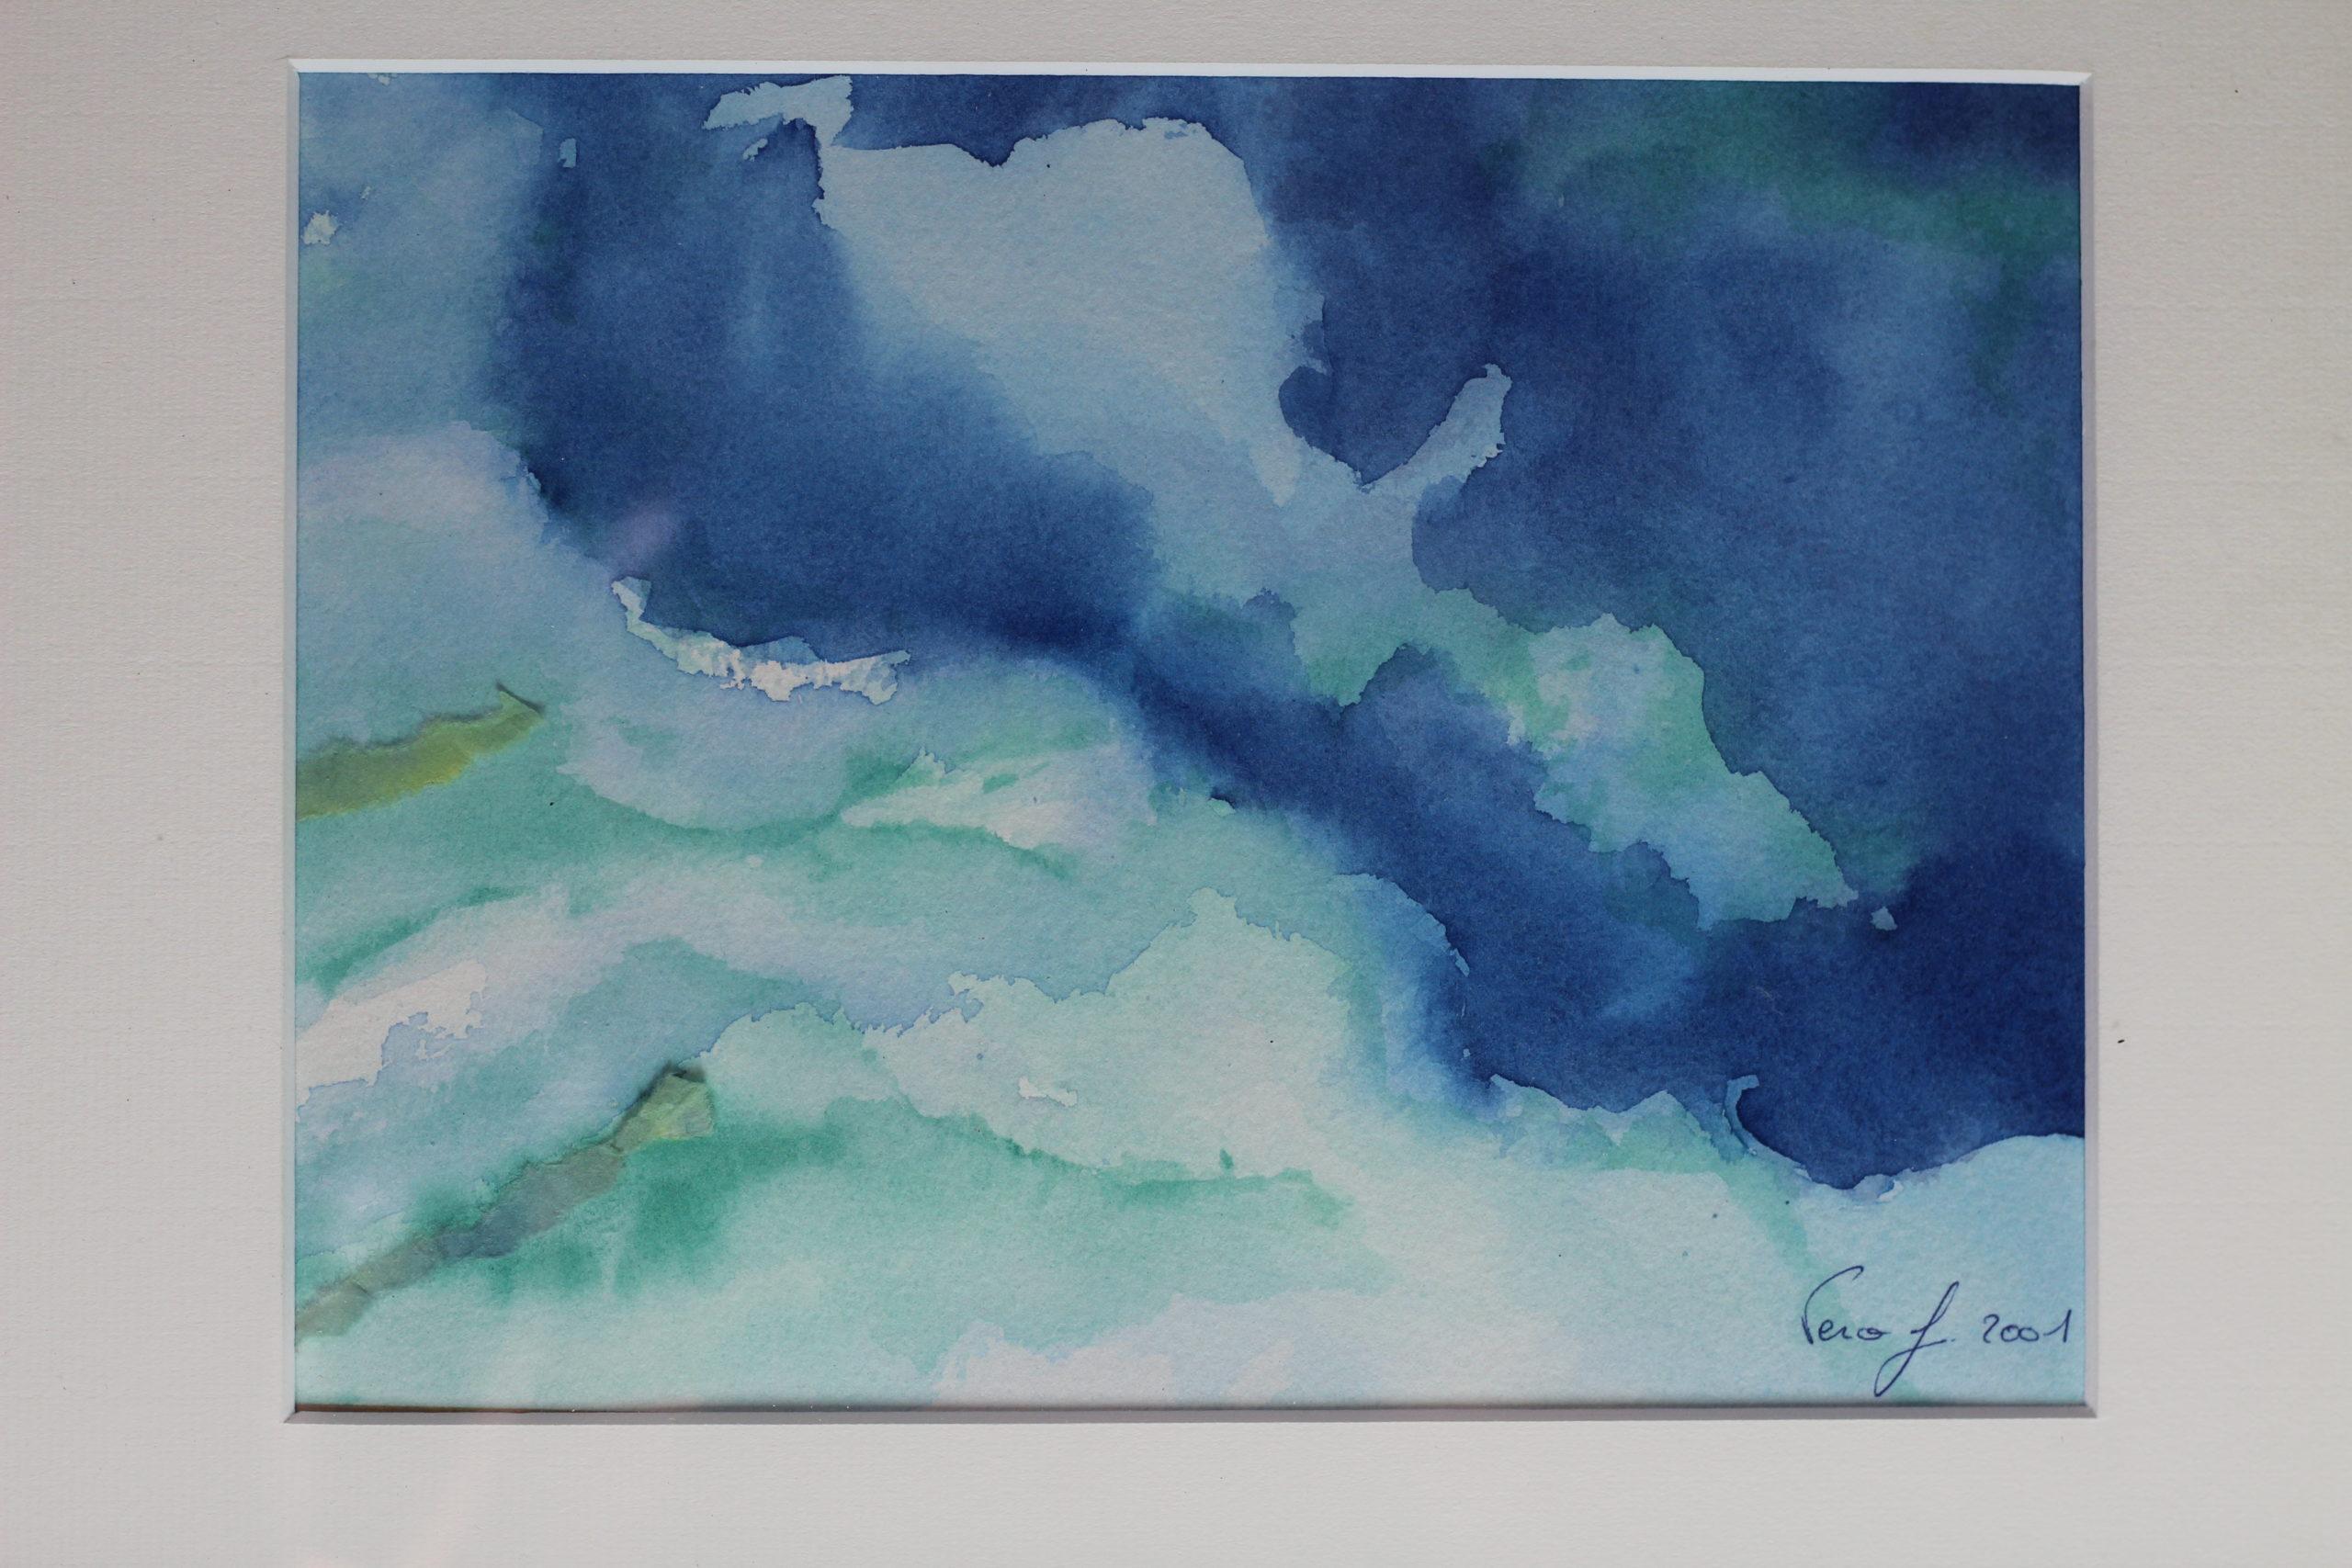 Peinture : Eau aquarelle (2001)